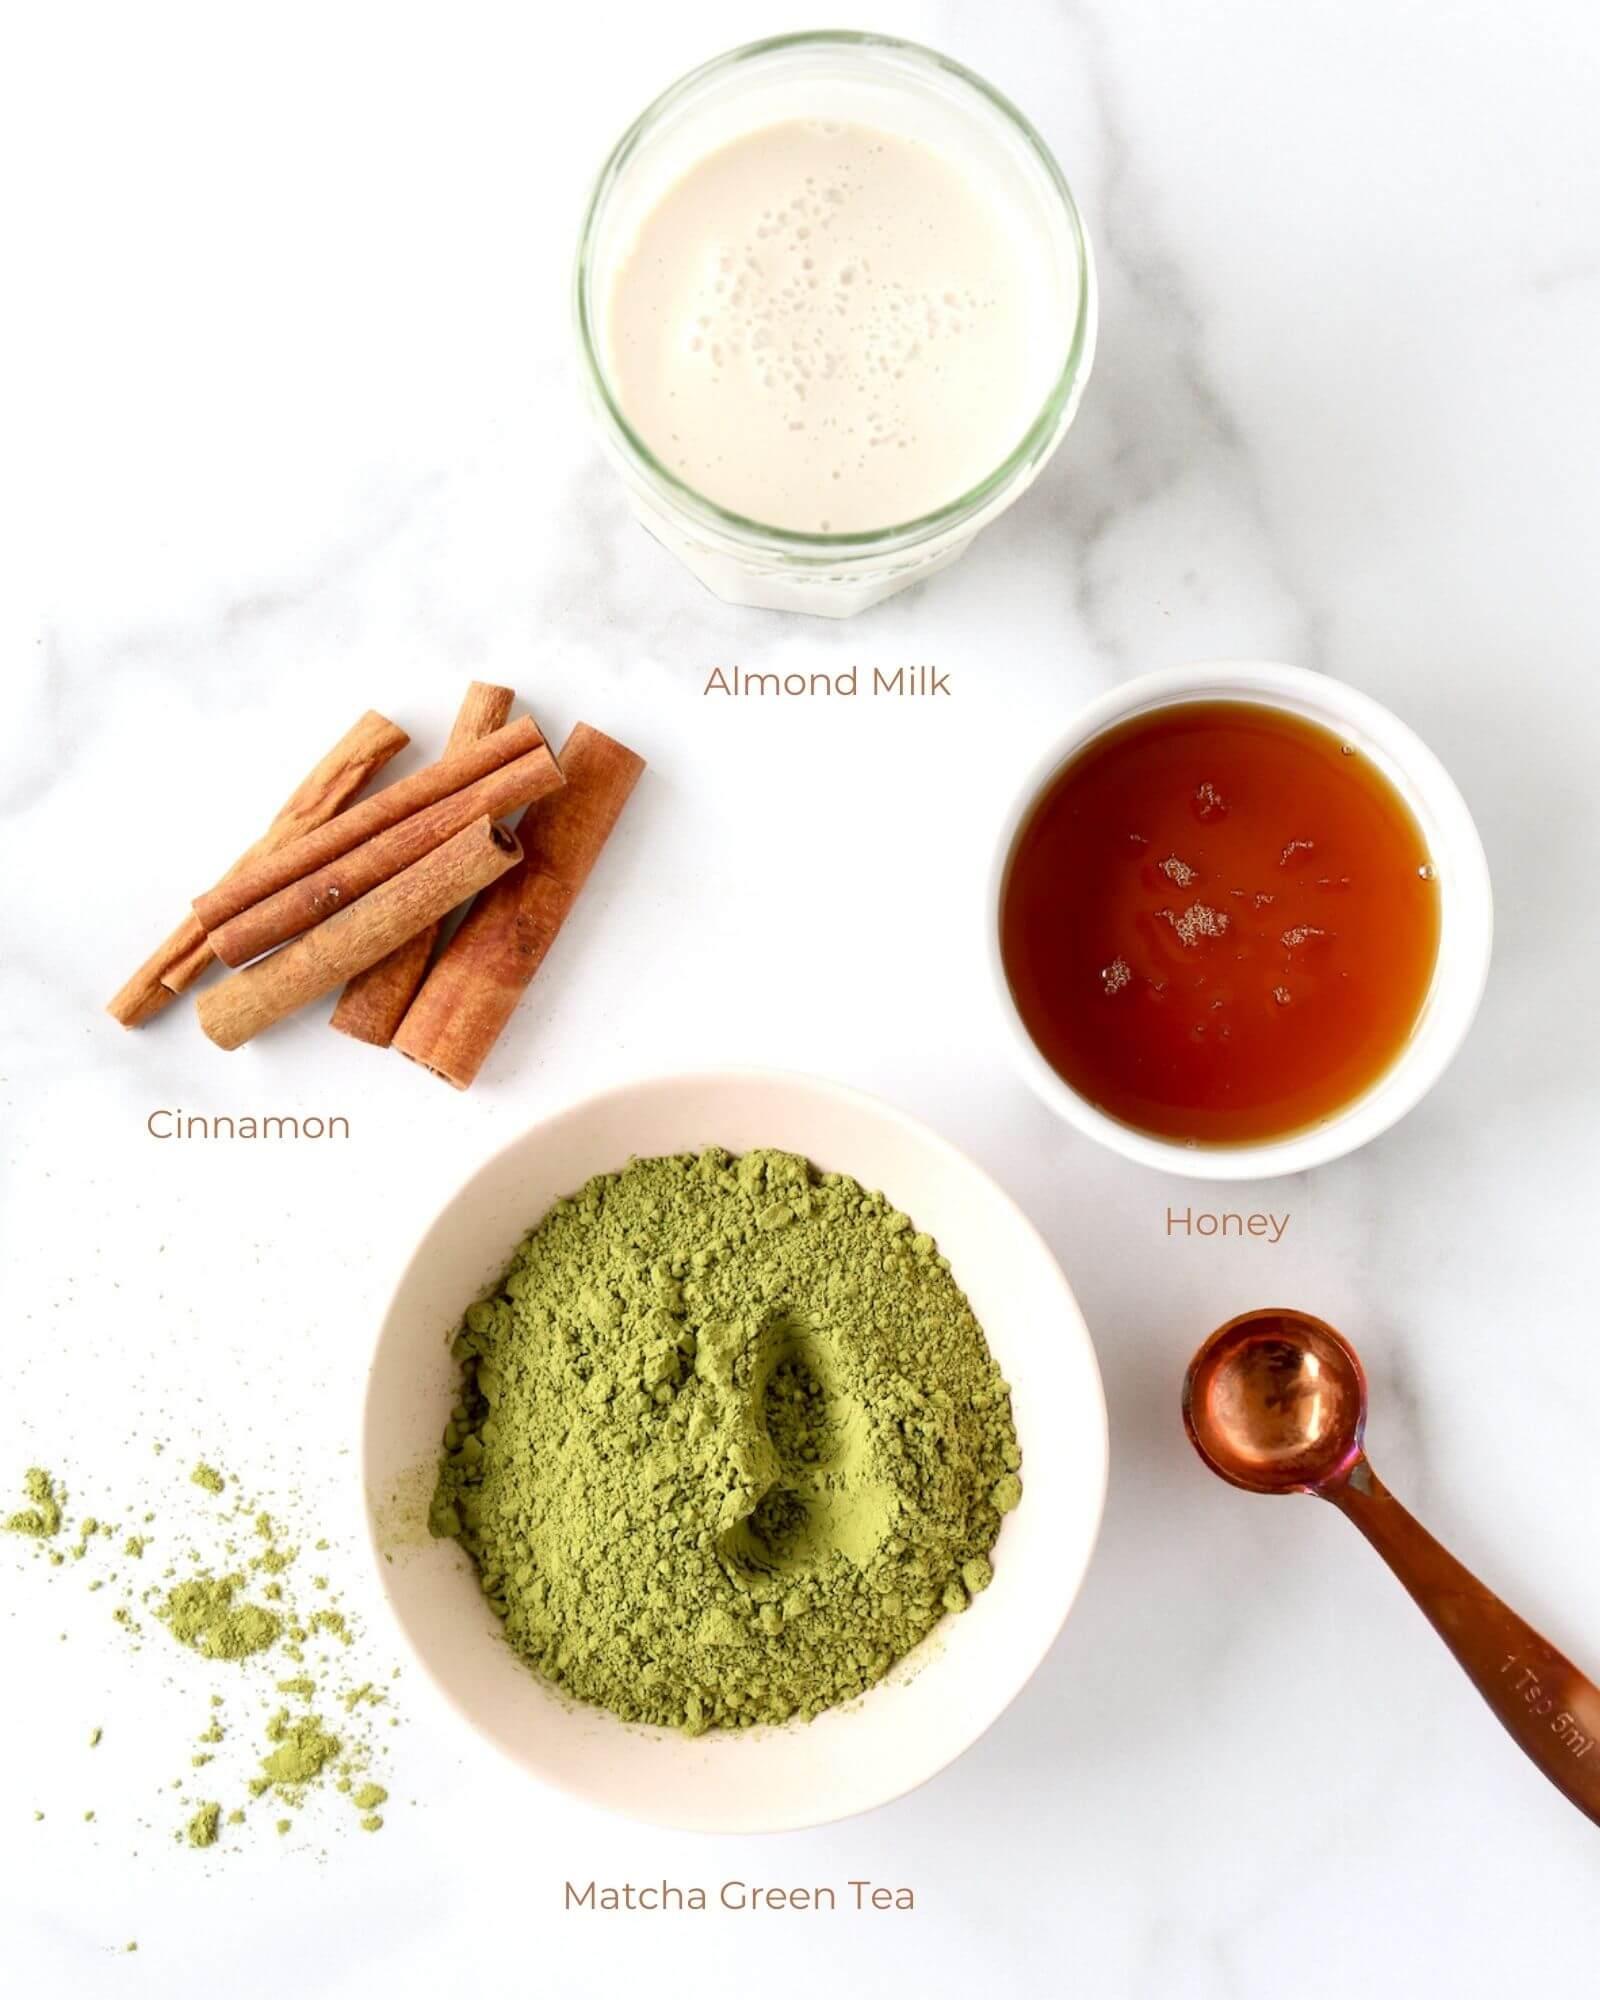 a bowl of matcha tea, a bowl of honey, cinnamon sticks and a jar of almond milk